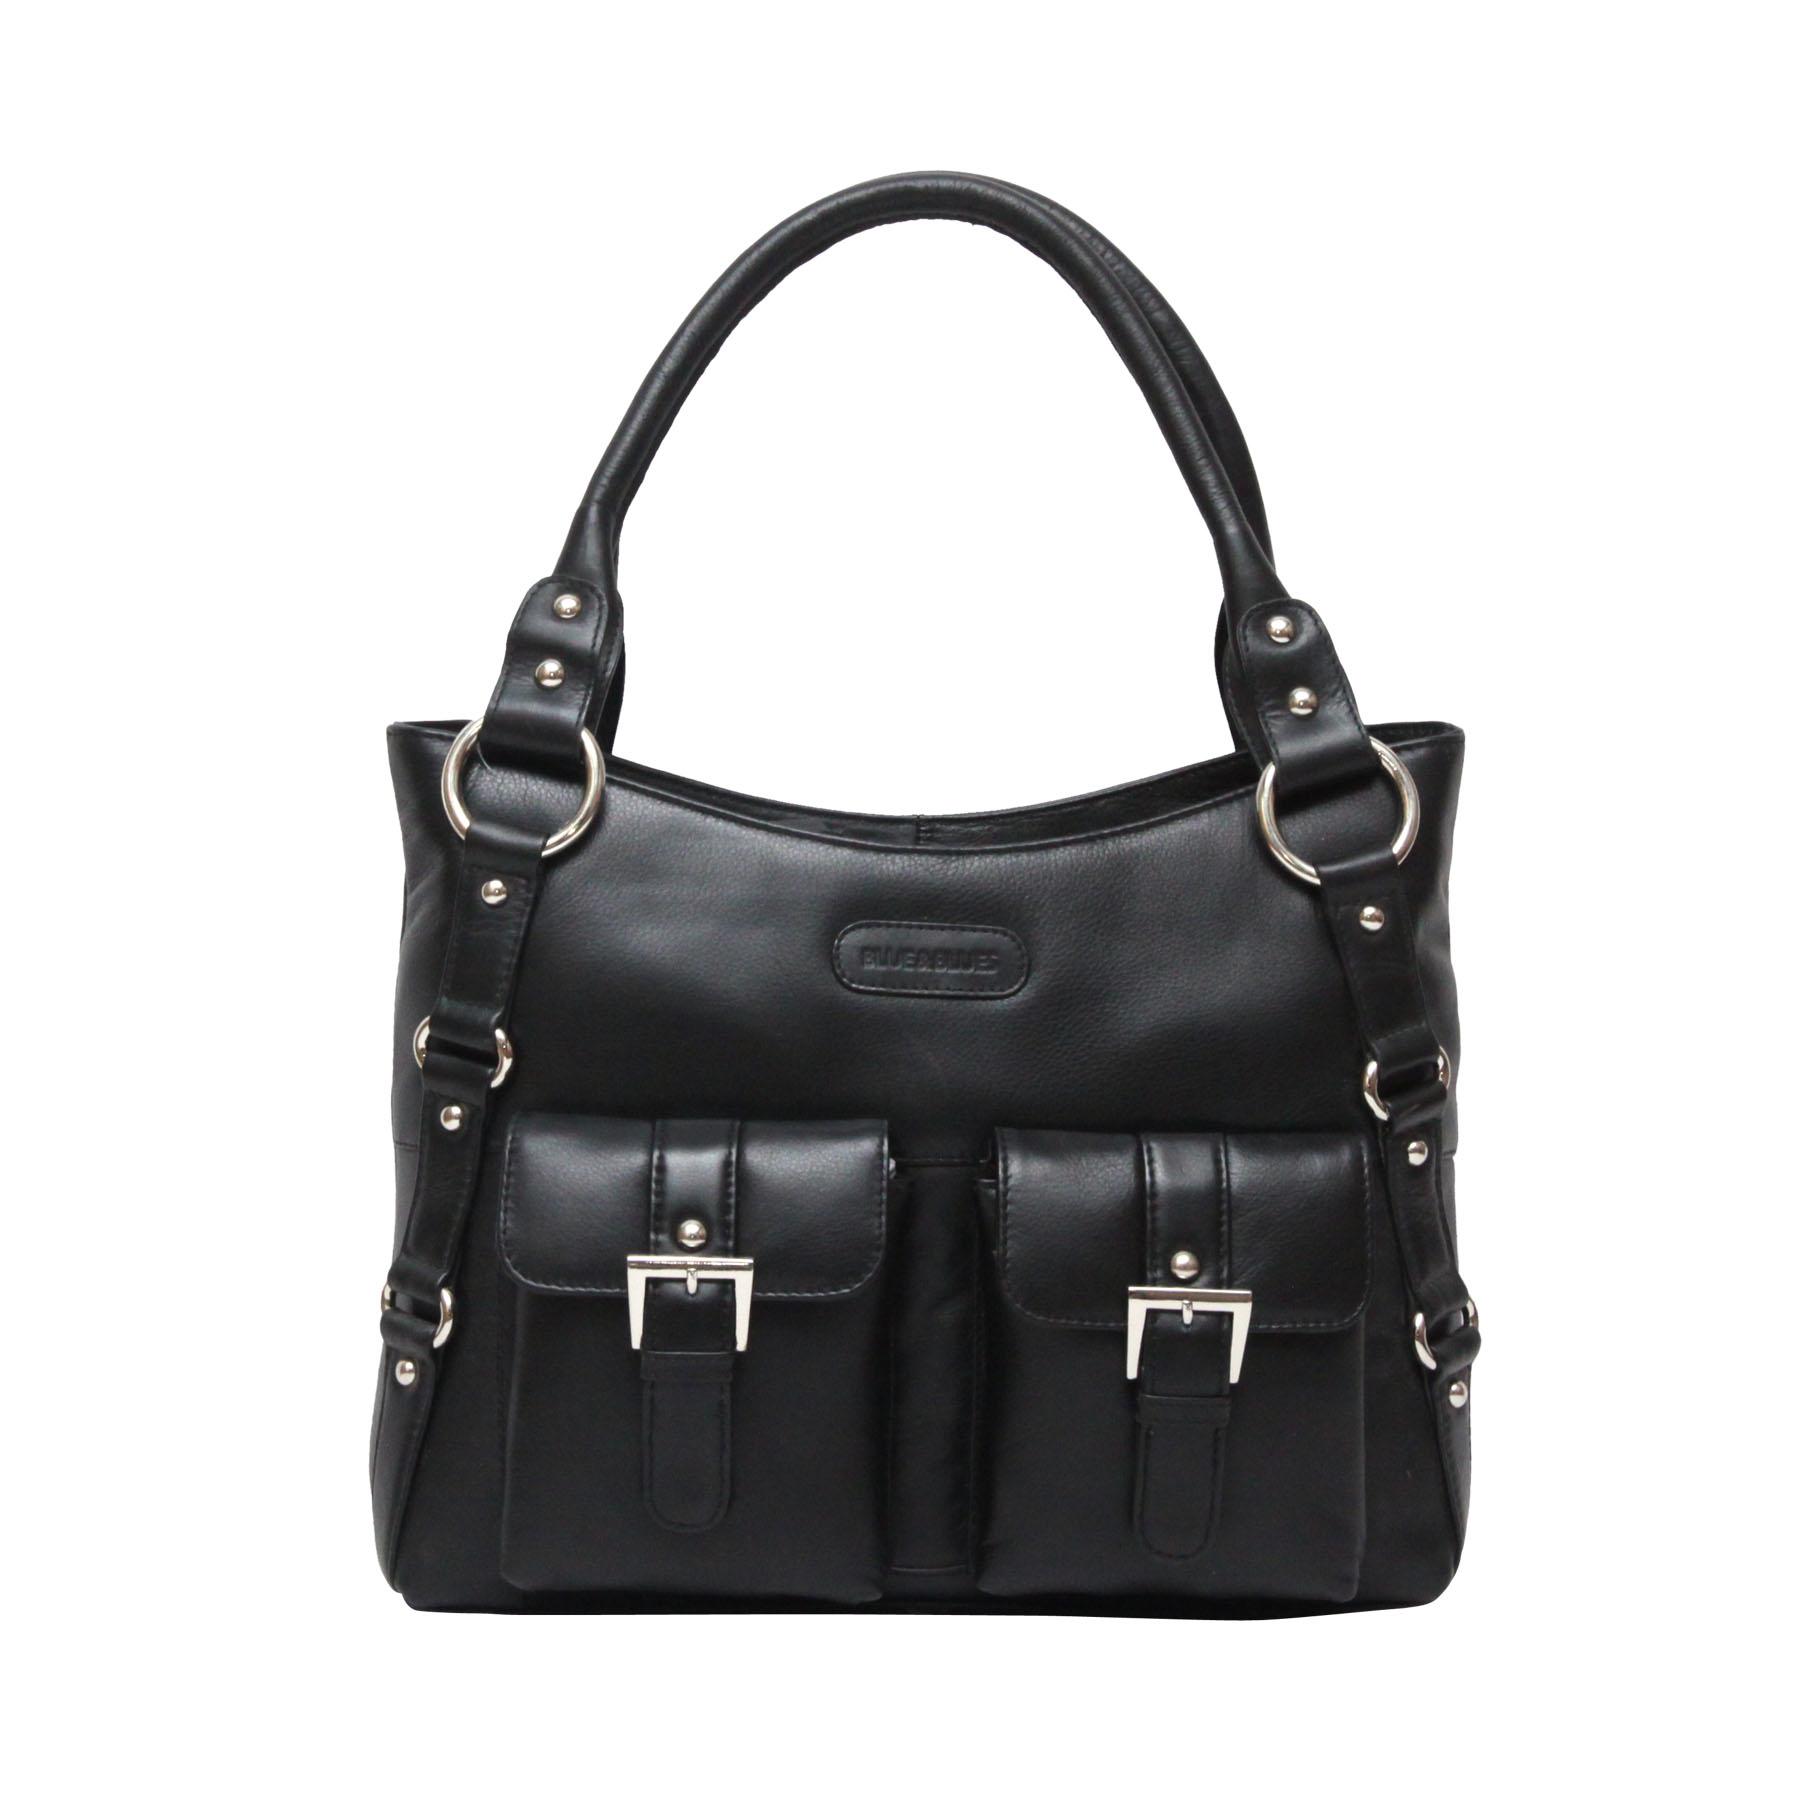 53545d4e40 Buy Handbags Online For Women From Blue   Blues